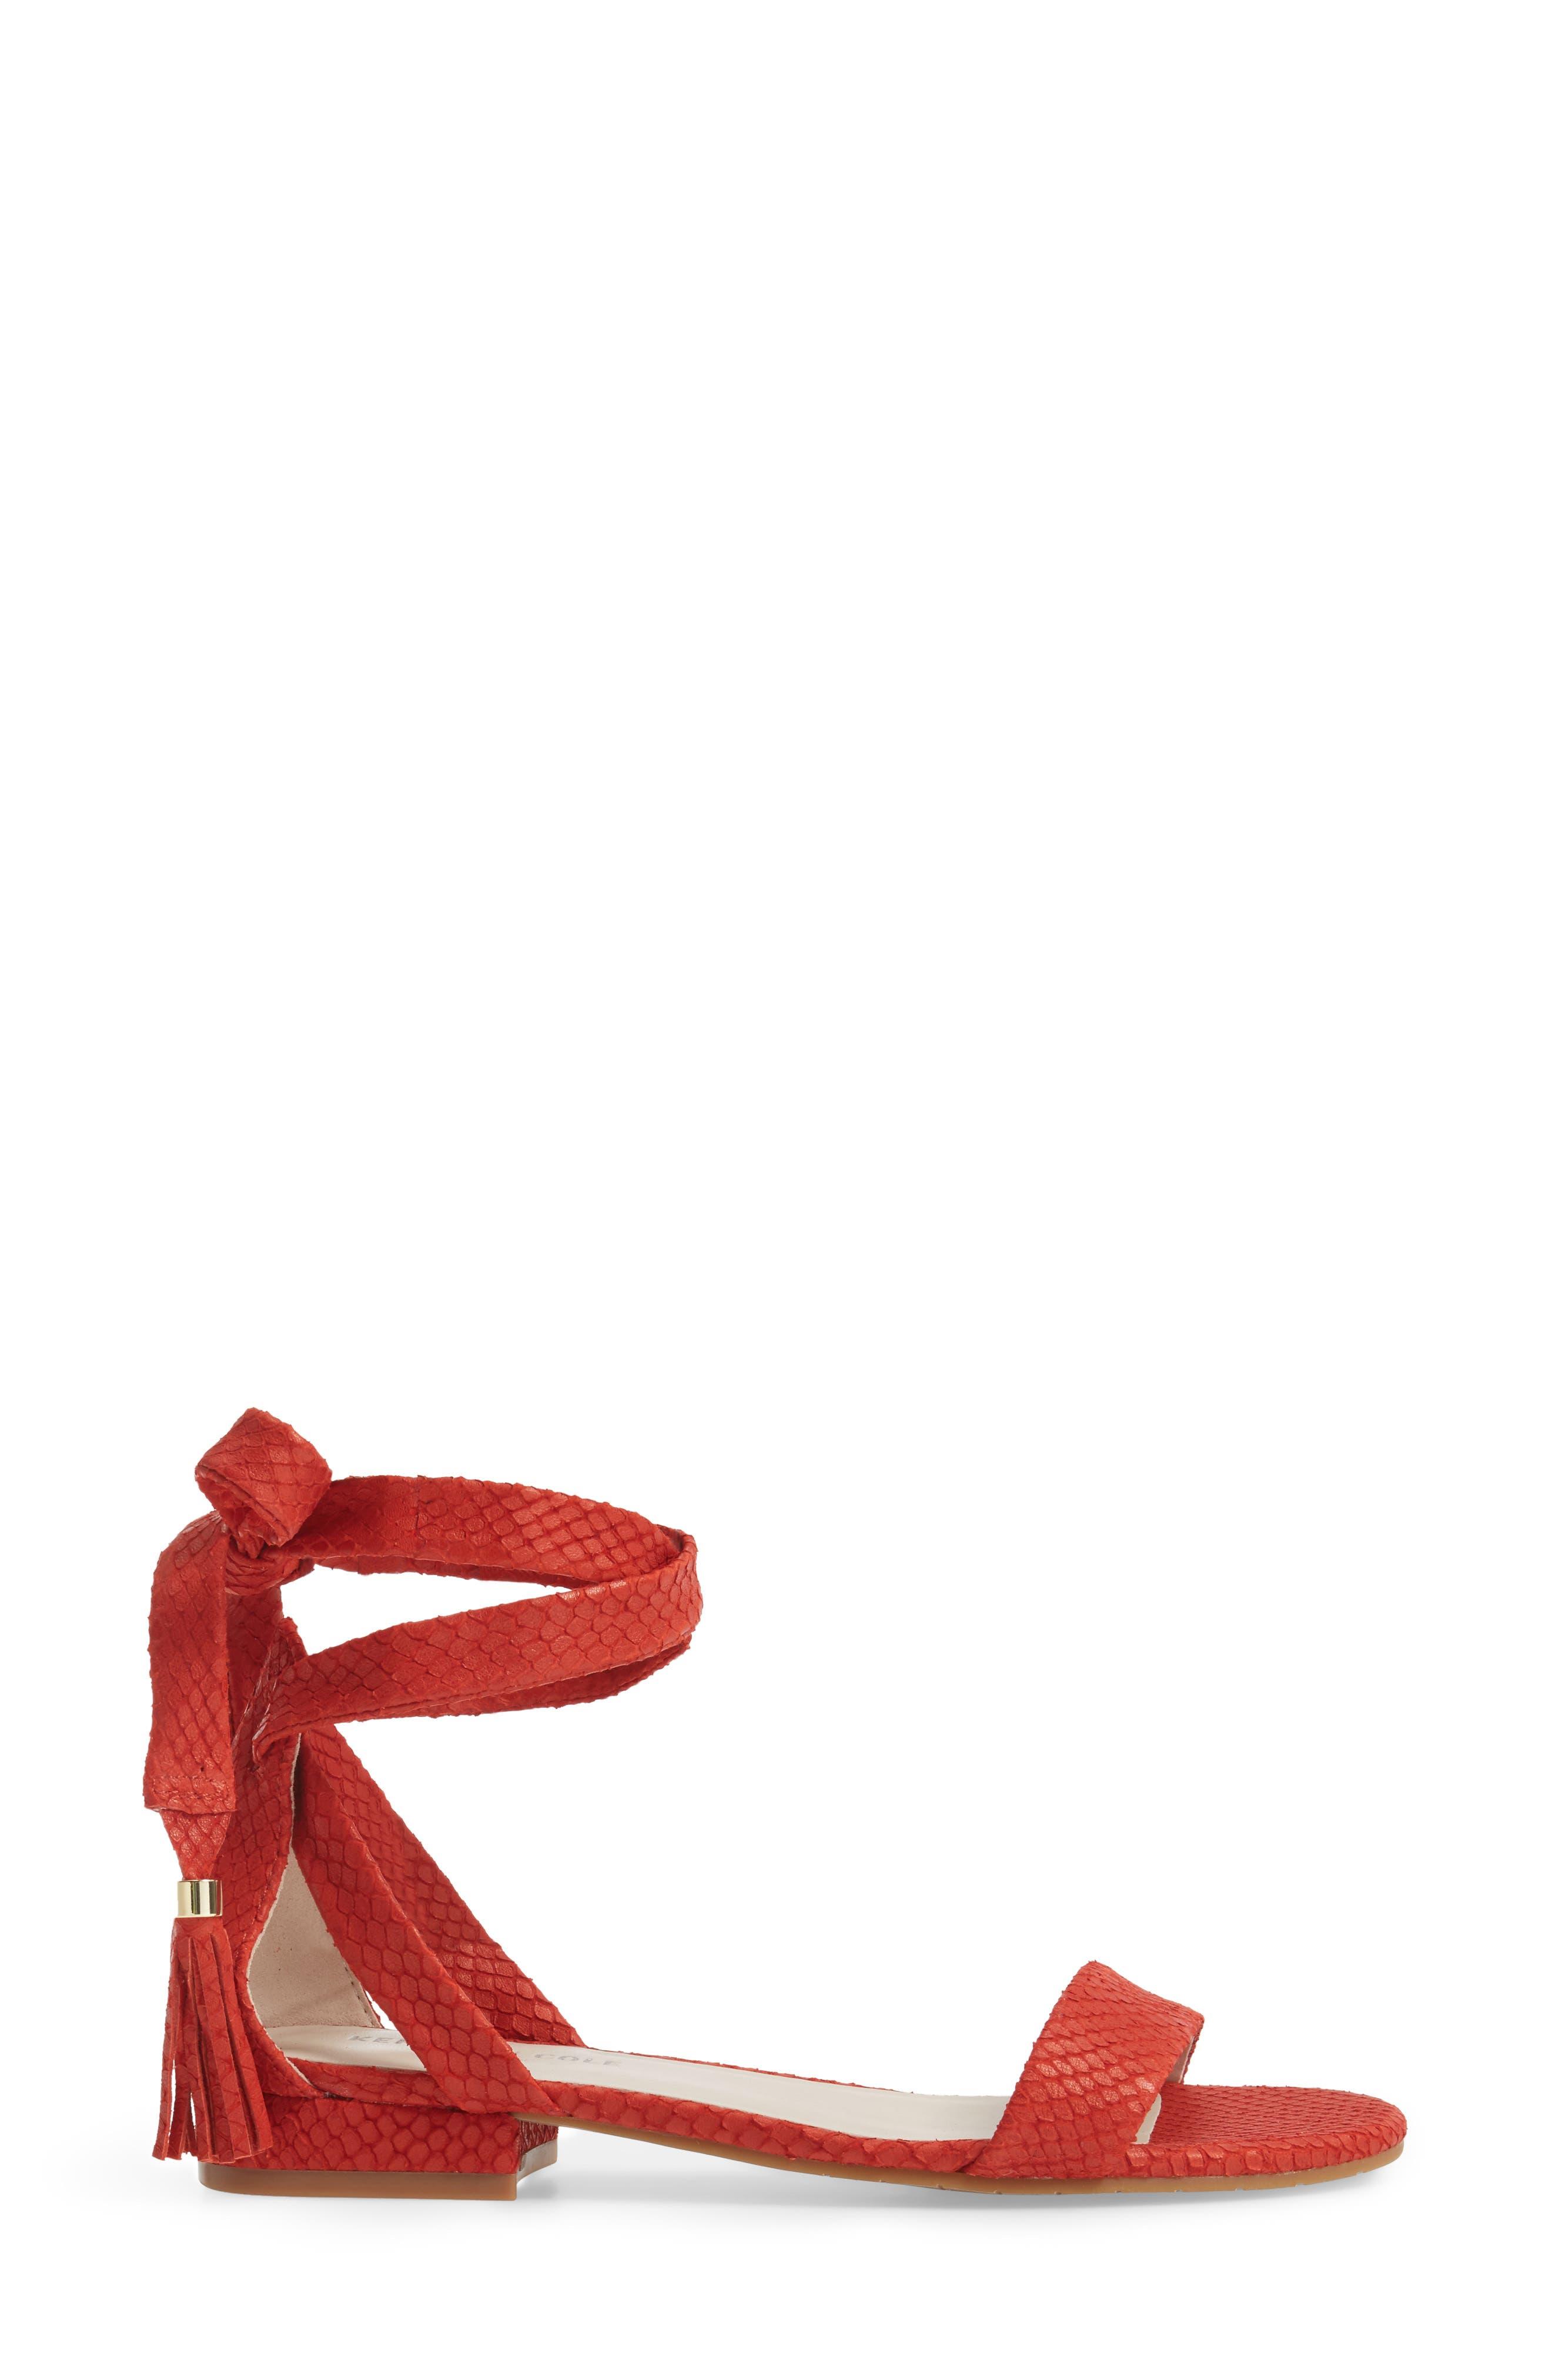 Valen Tassel Lace-Up Sandal,                             Alternate thumbnail 38, color,